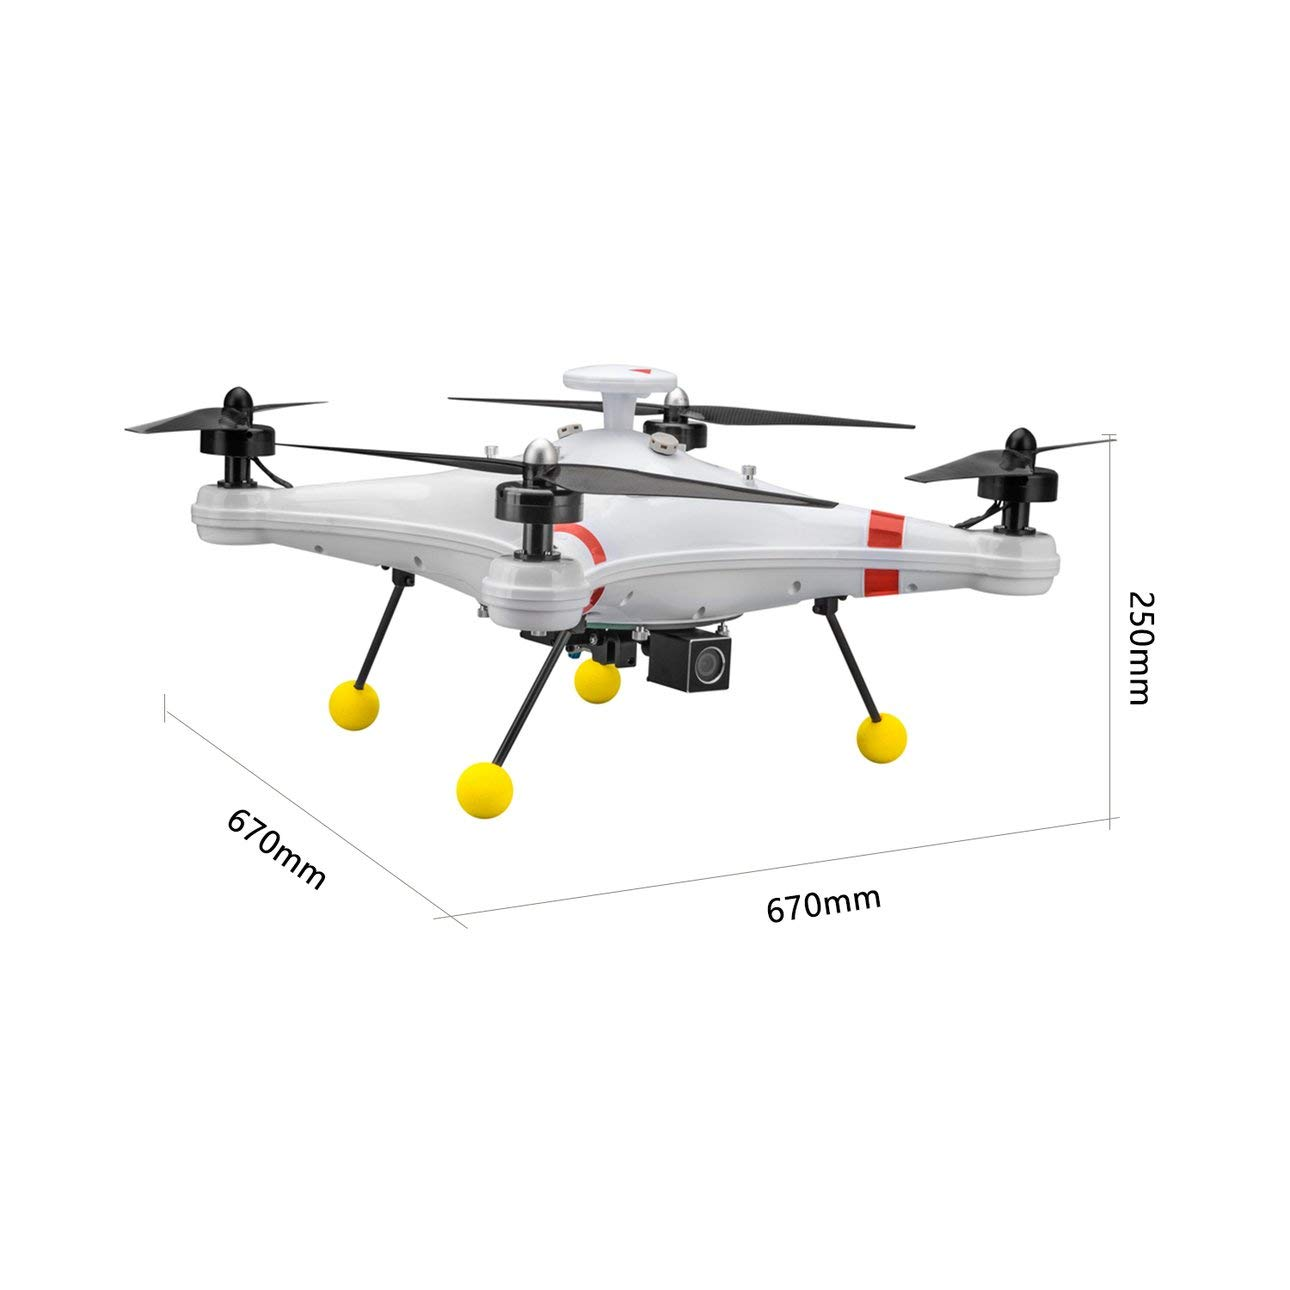 Ballylelly H480 Brushless 5.8G FPV 700TVL cámara GPS Quadcopter ...